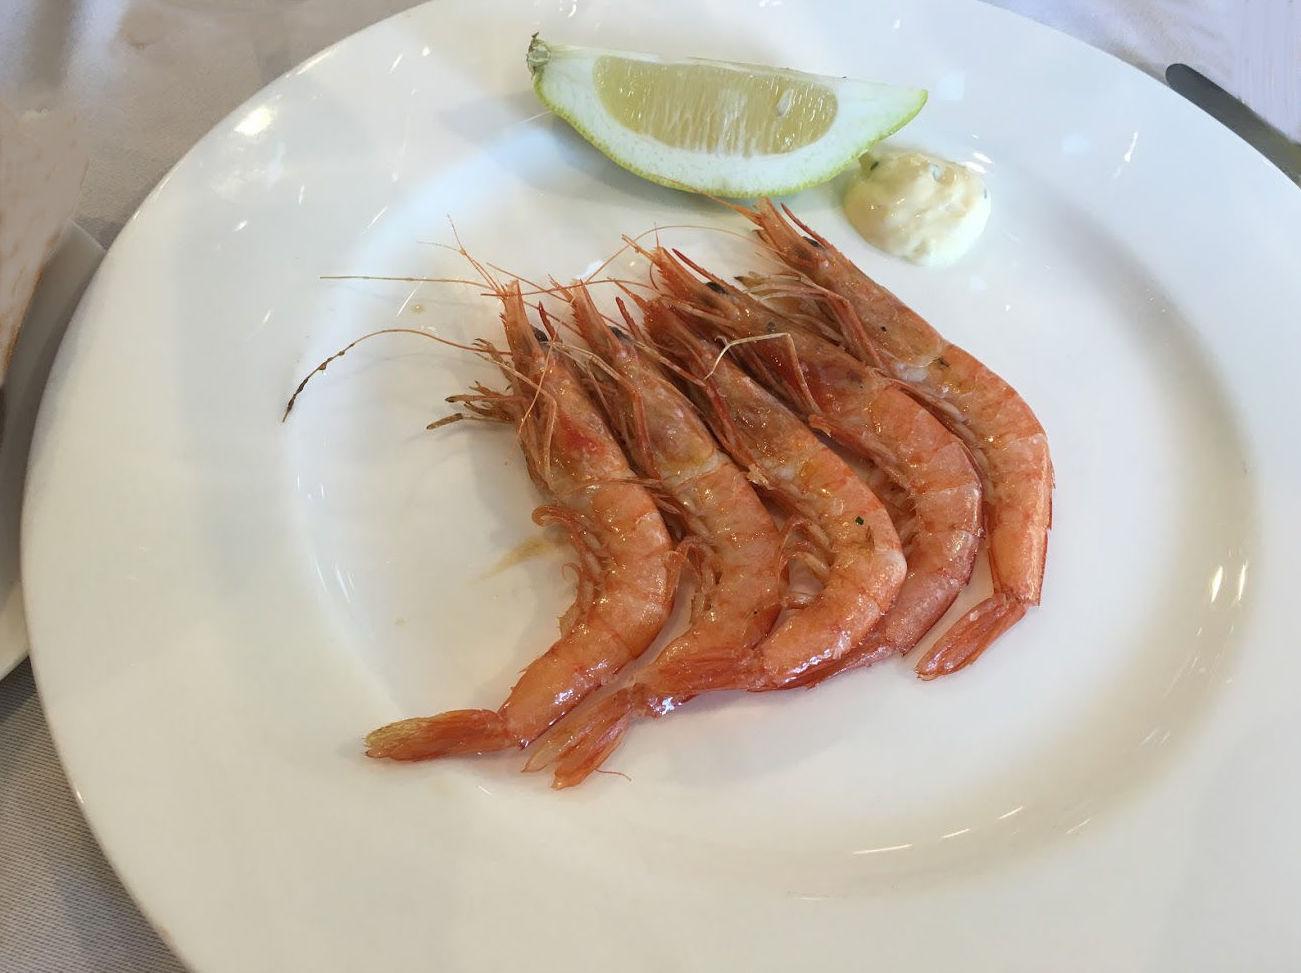 Foto 21 de Restaurante en Juslapeña | Restaurante Casa Arteta